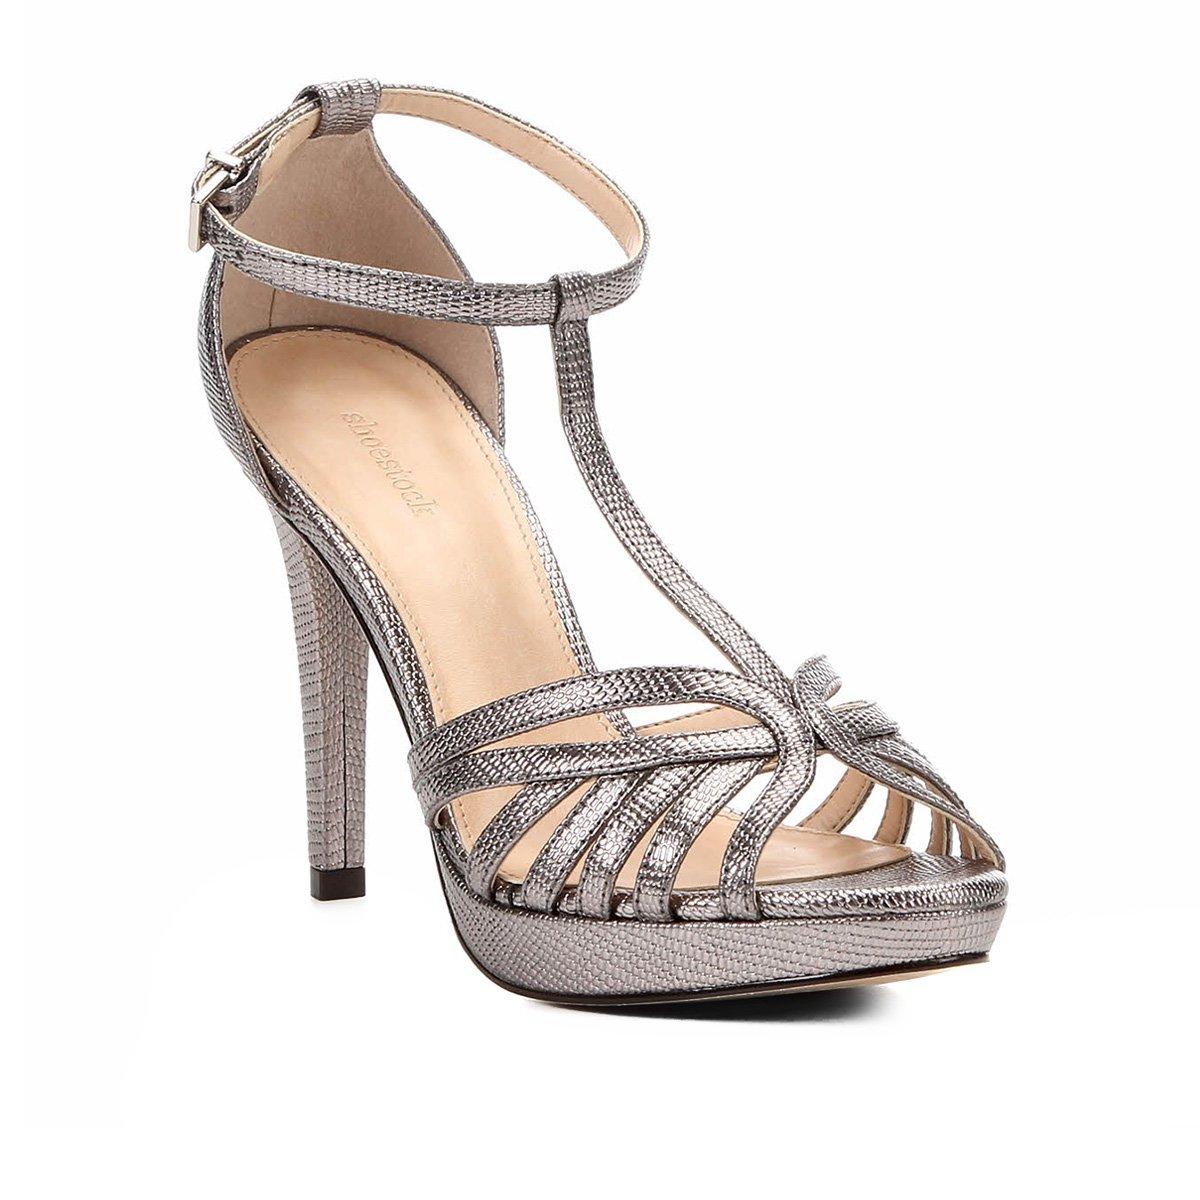 ca39ac1d9 Sandália Shoestock Metalizada Meia Pata Tirinhas Feminina - Chumbo |  Shoestock